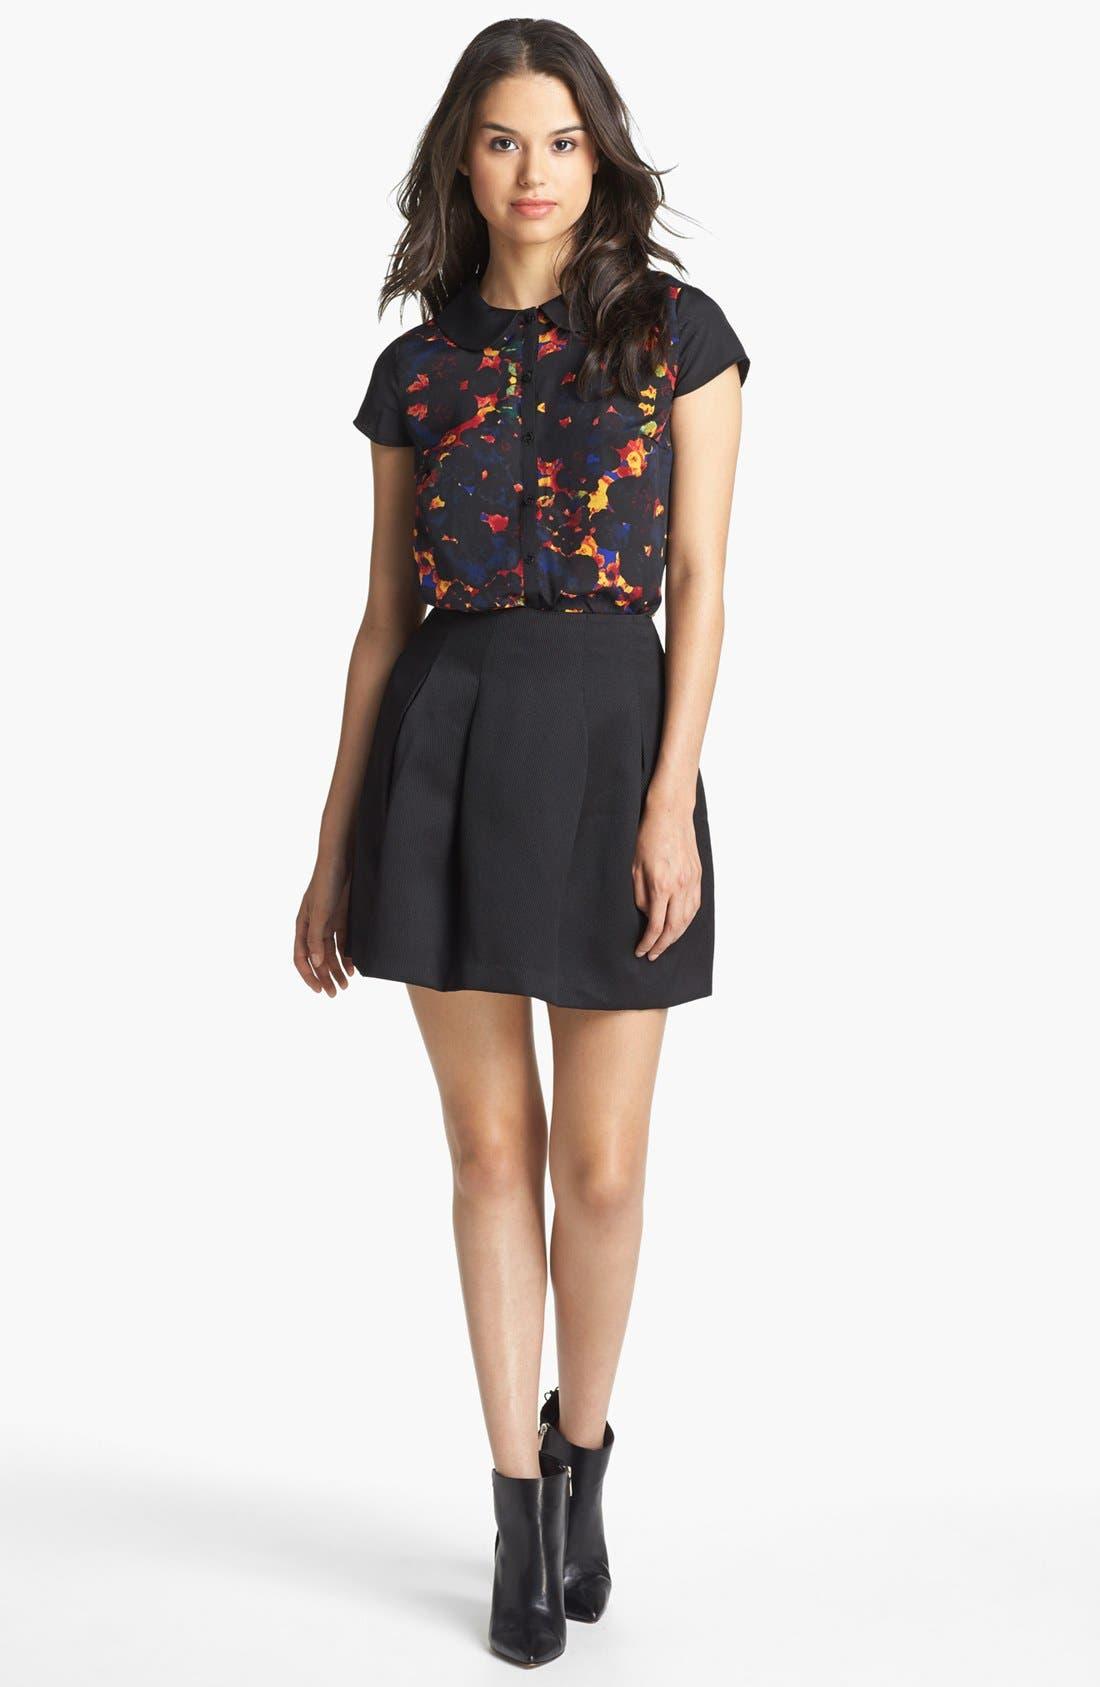 Main Image - Kensie Blouse & Miniskirt